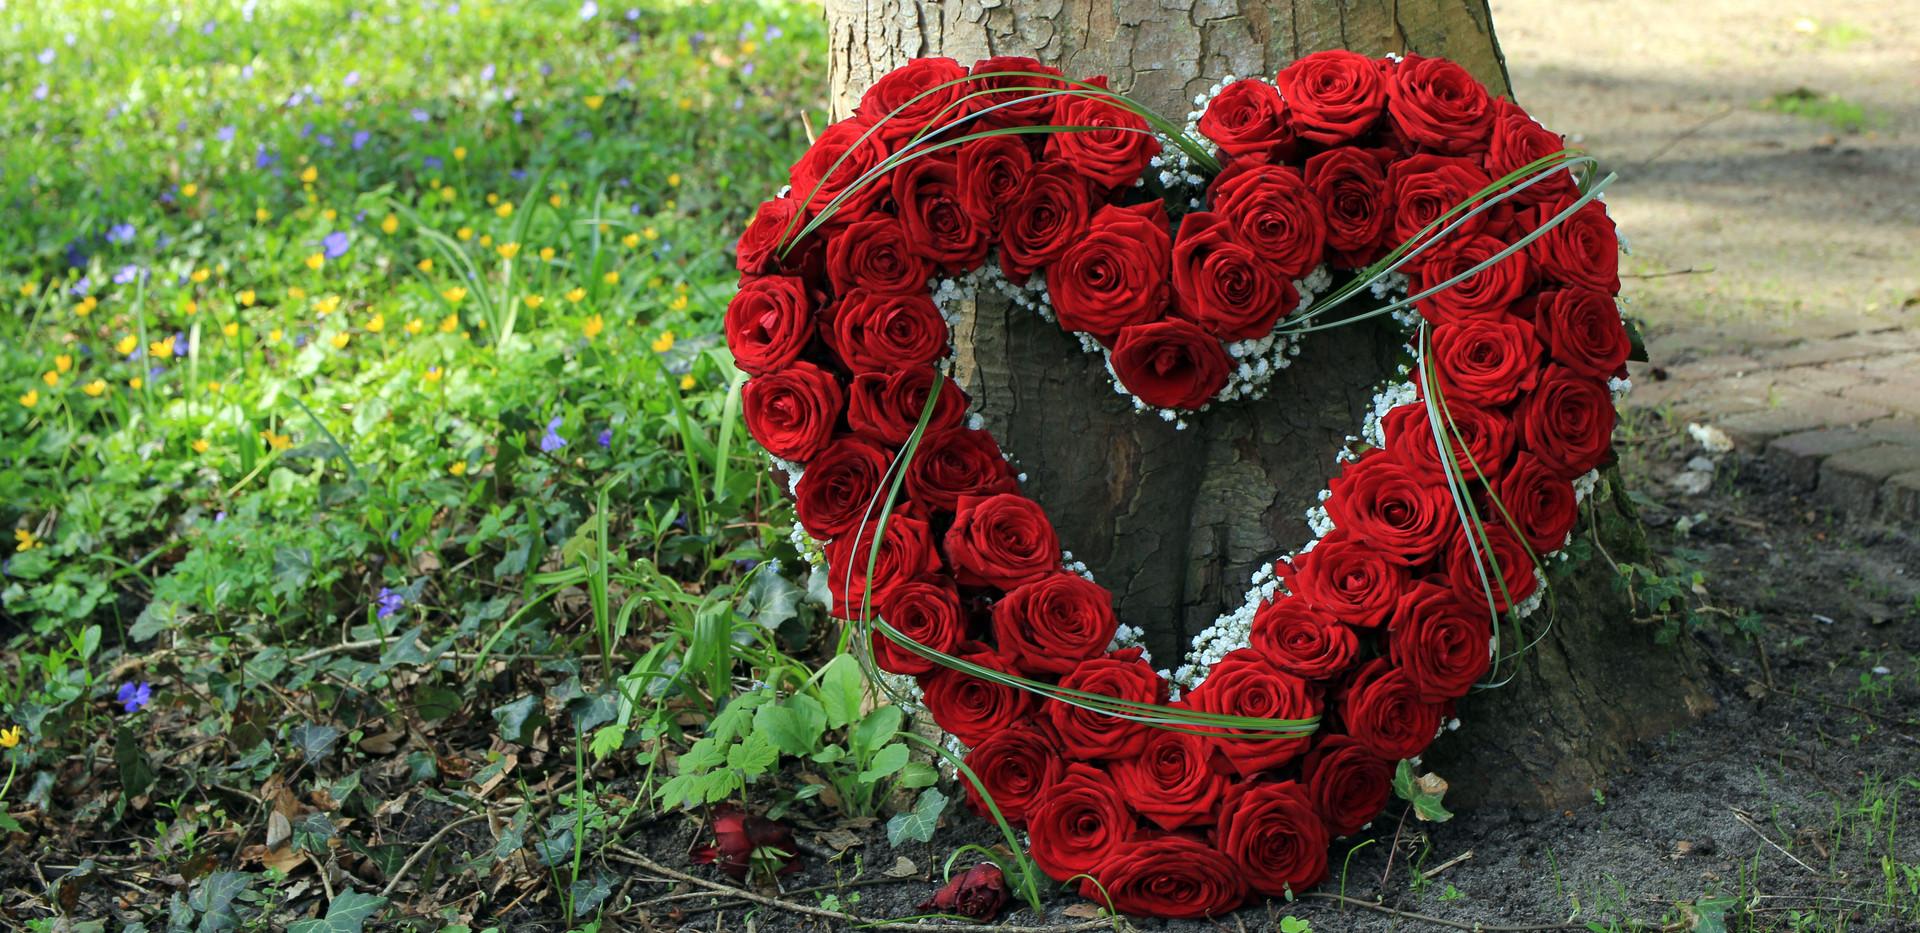 Heart shaped sympathy flowers  or funera